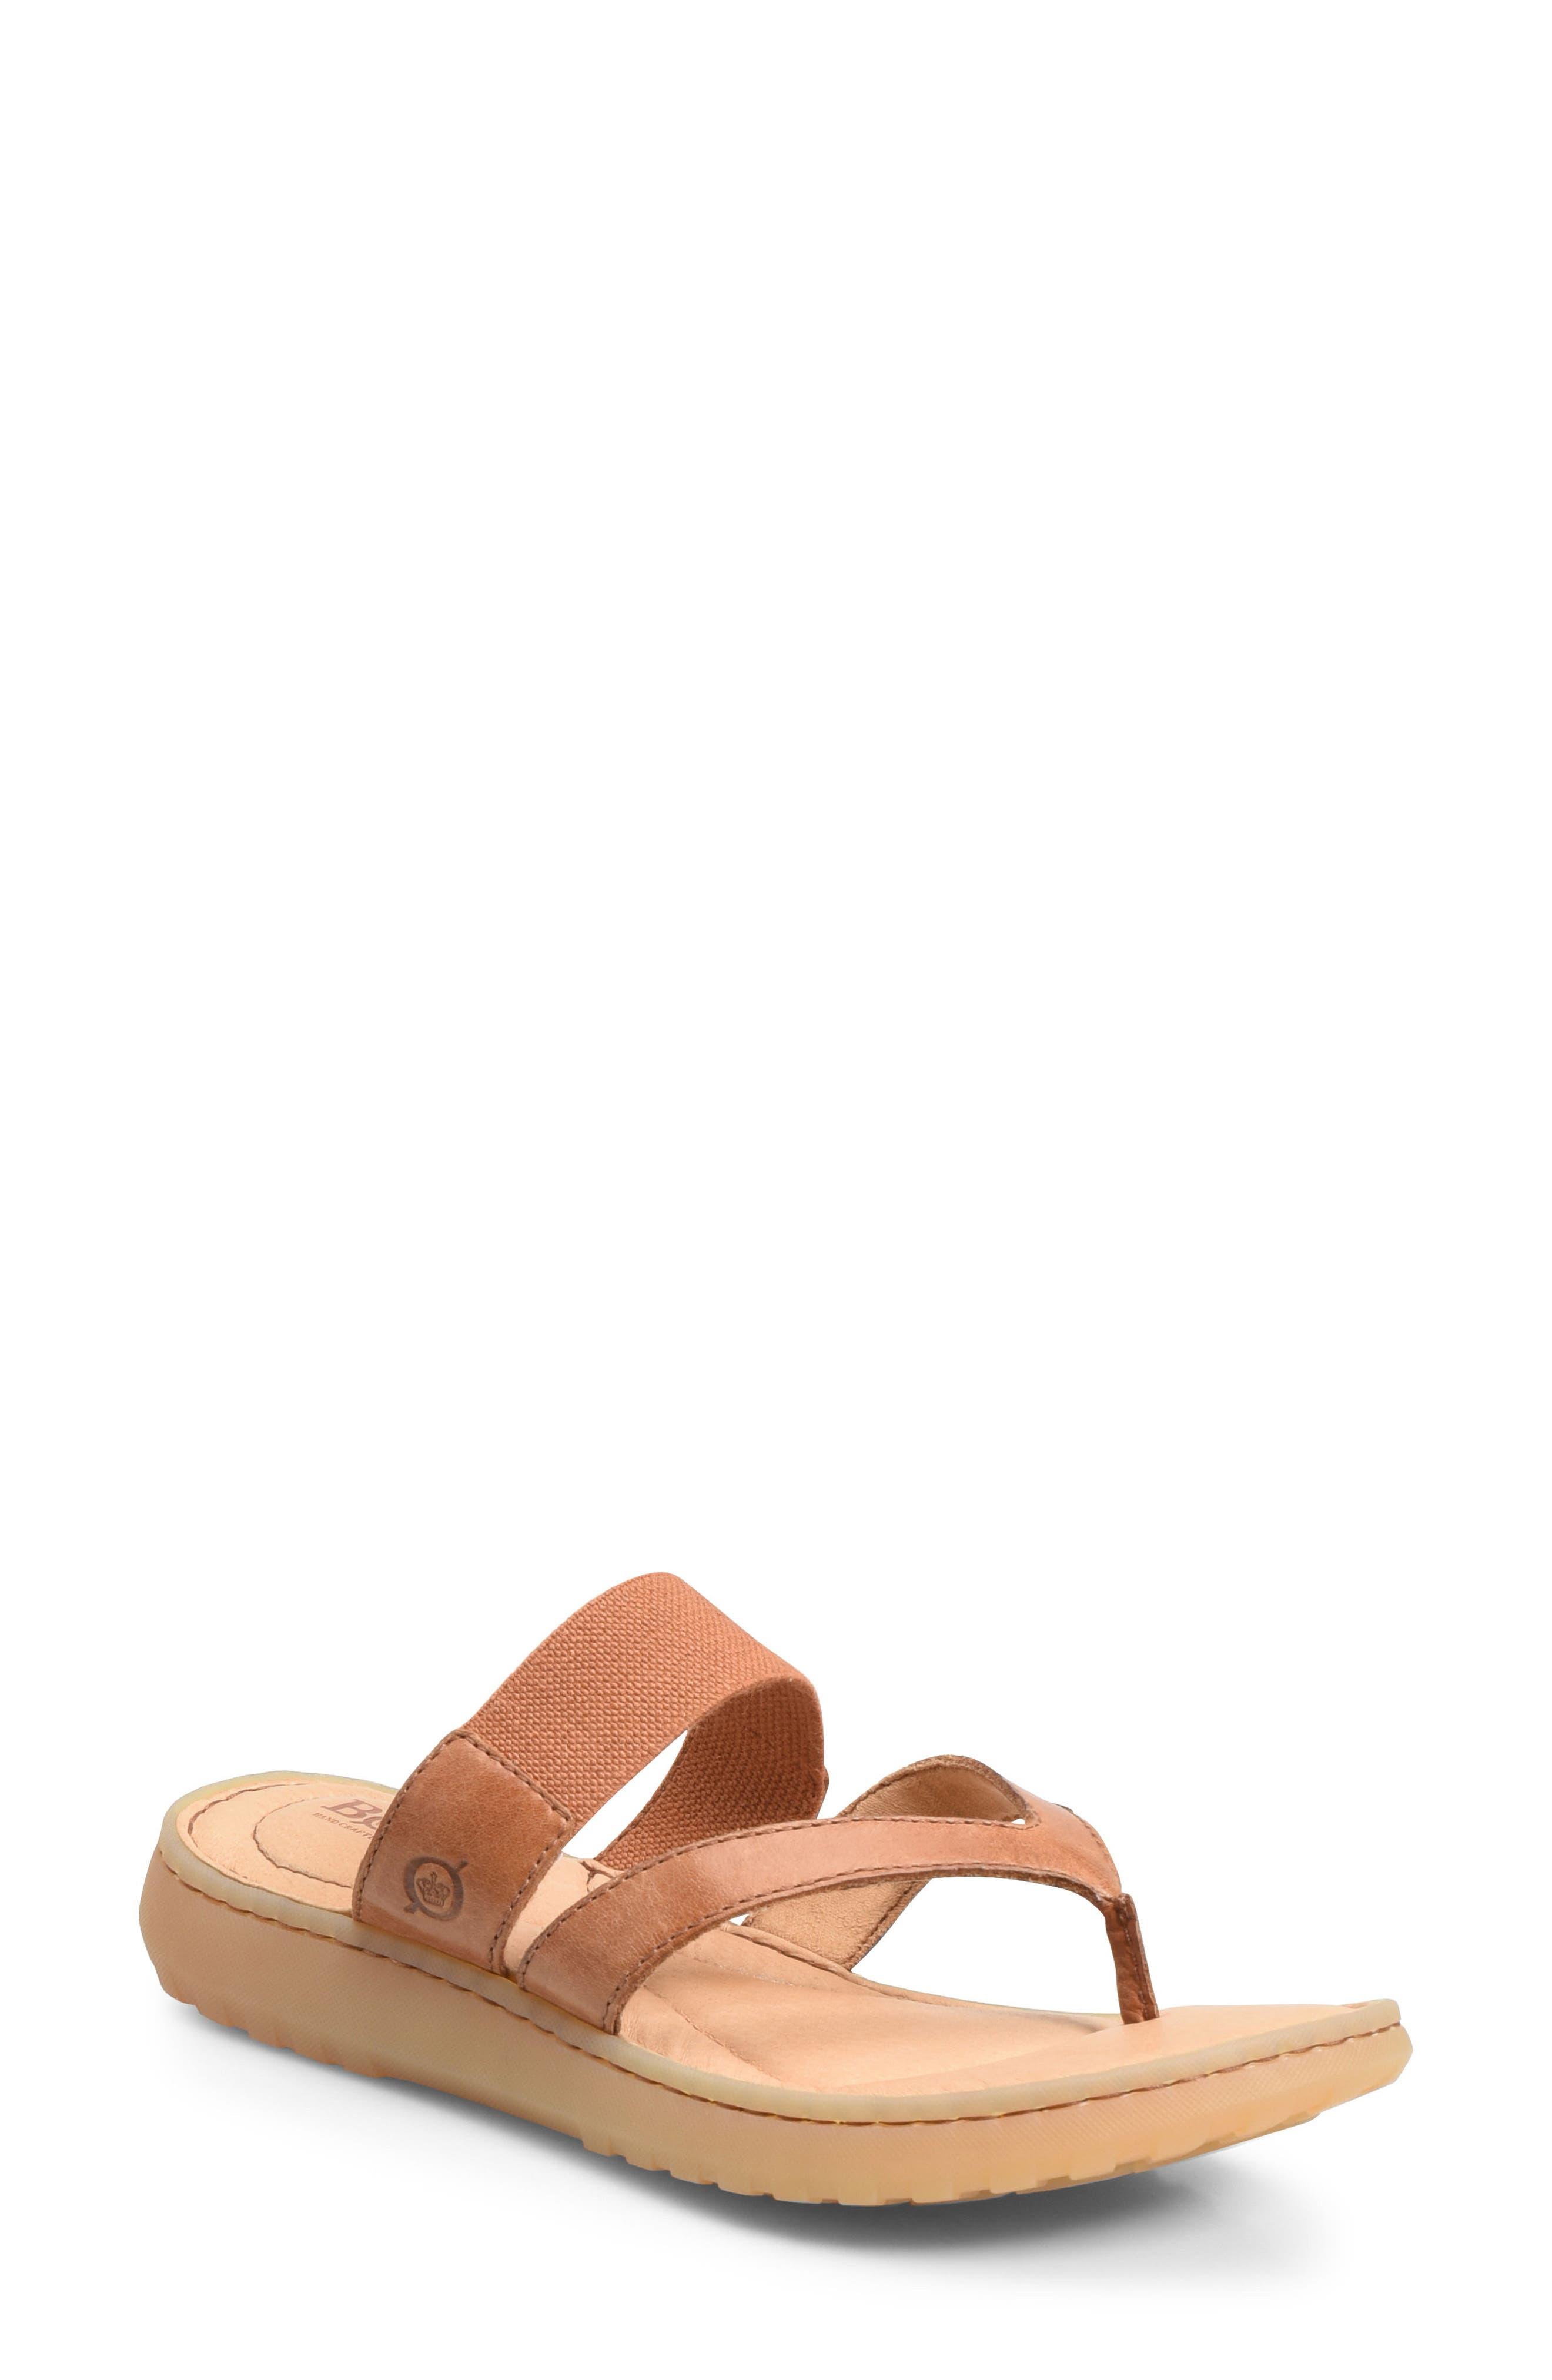 Nevis Sandal,                         Main,                         color, Brown Leather